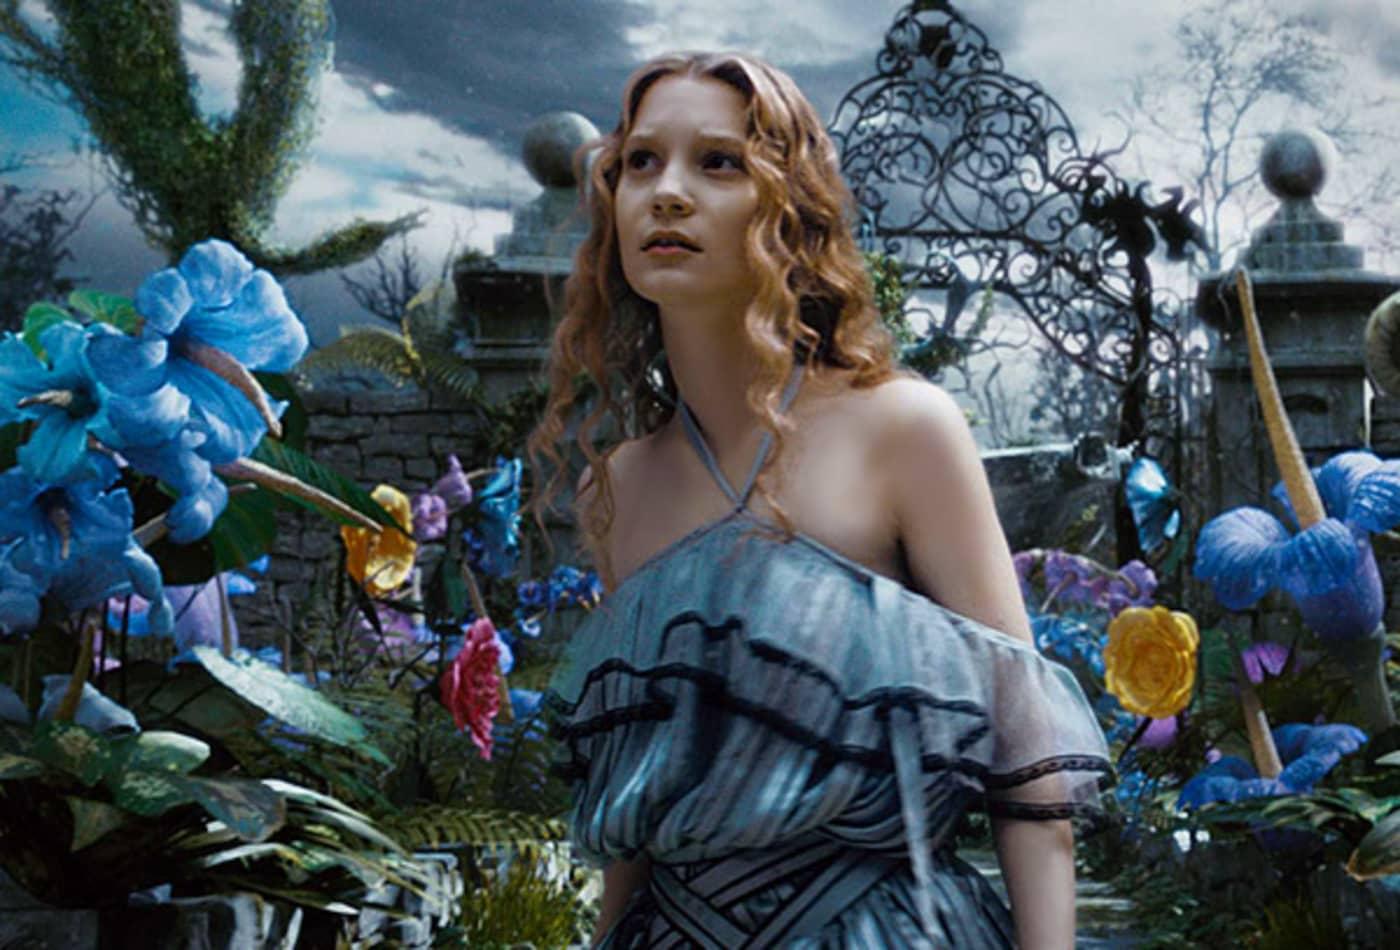 Alice-In-Wonderland-Highest-Grossing-Fantasy-Movies-CNBC.jpg